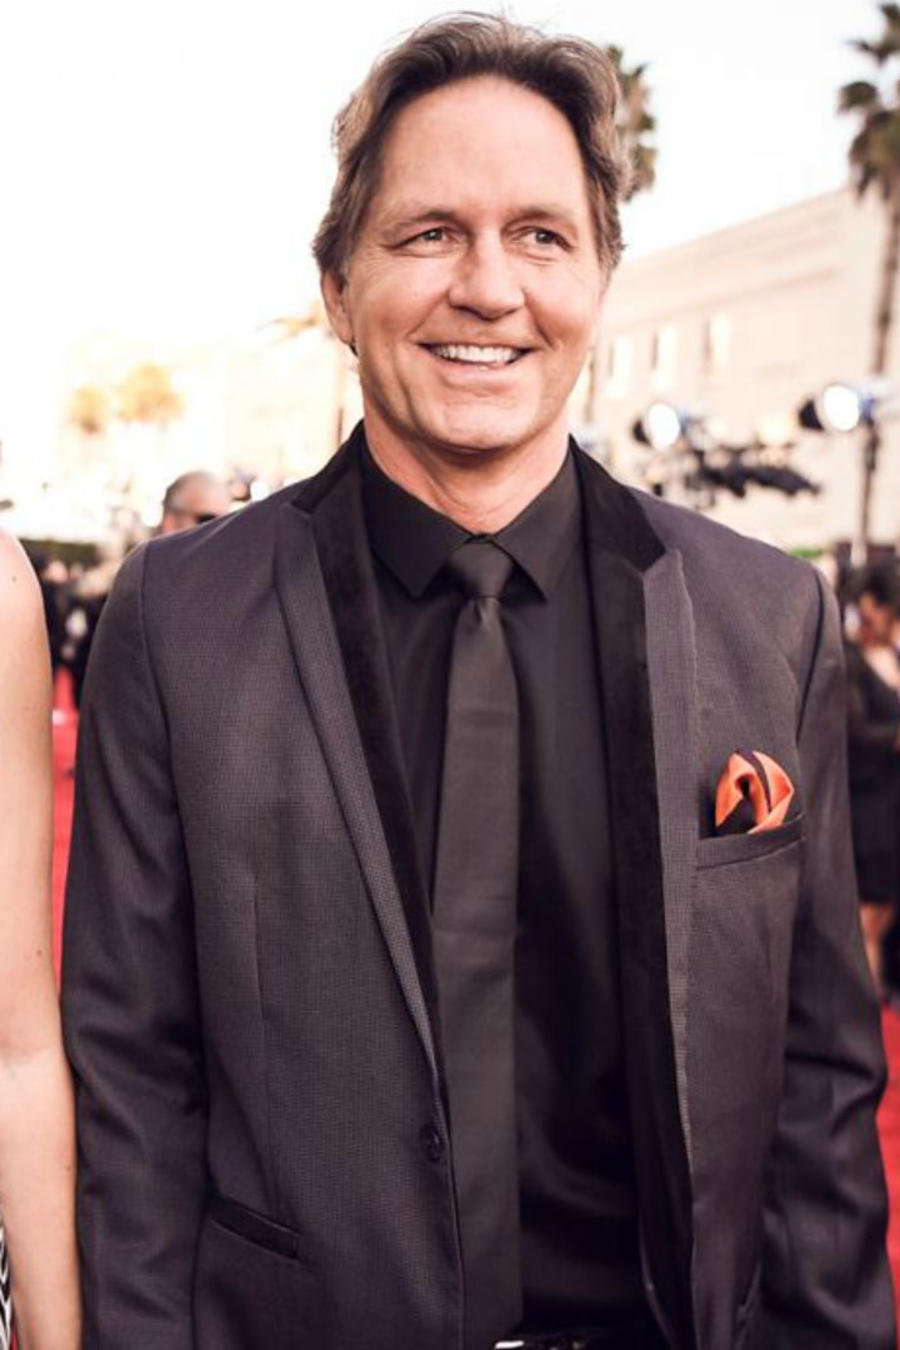 Guy Ecker en los Latin American Music Awards